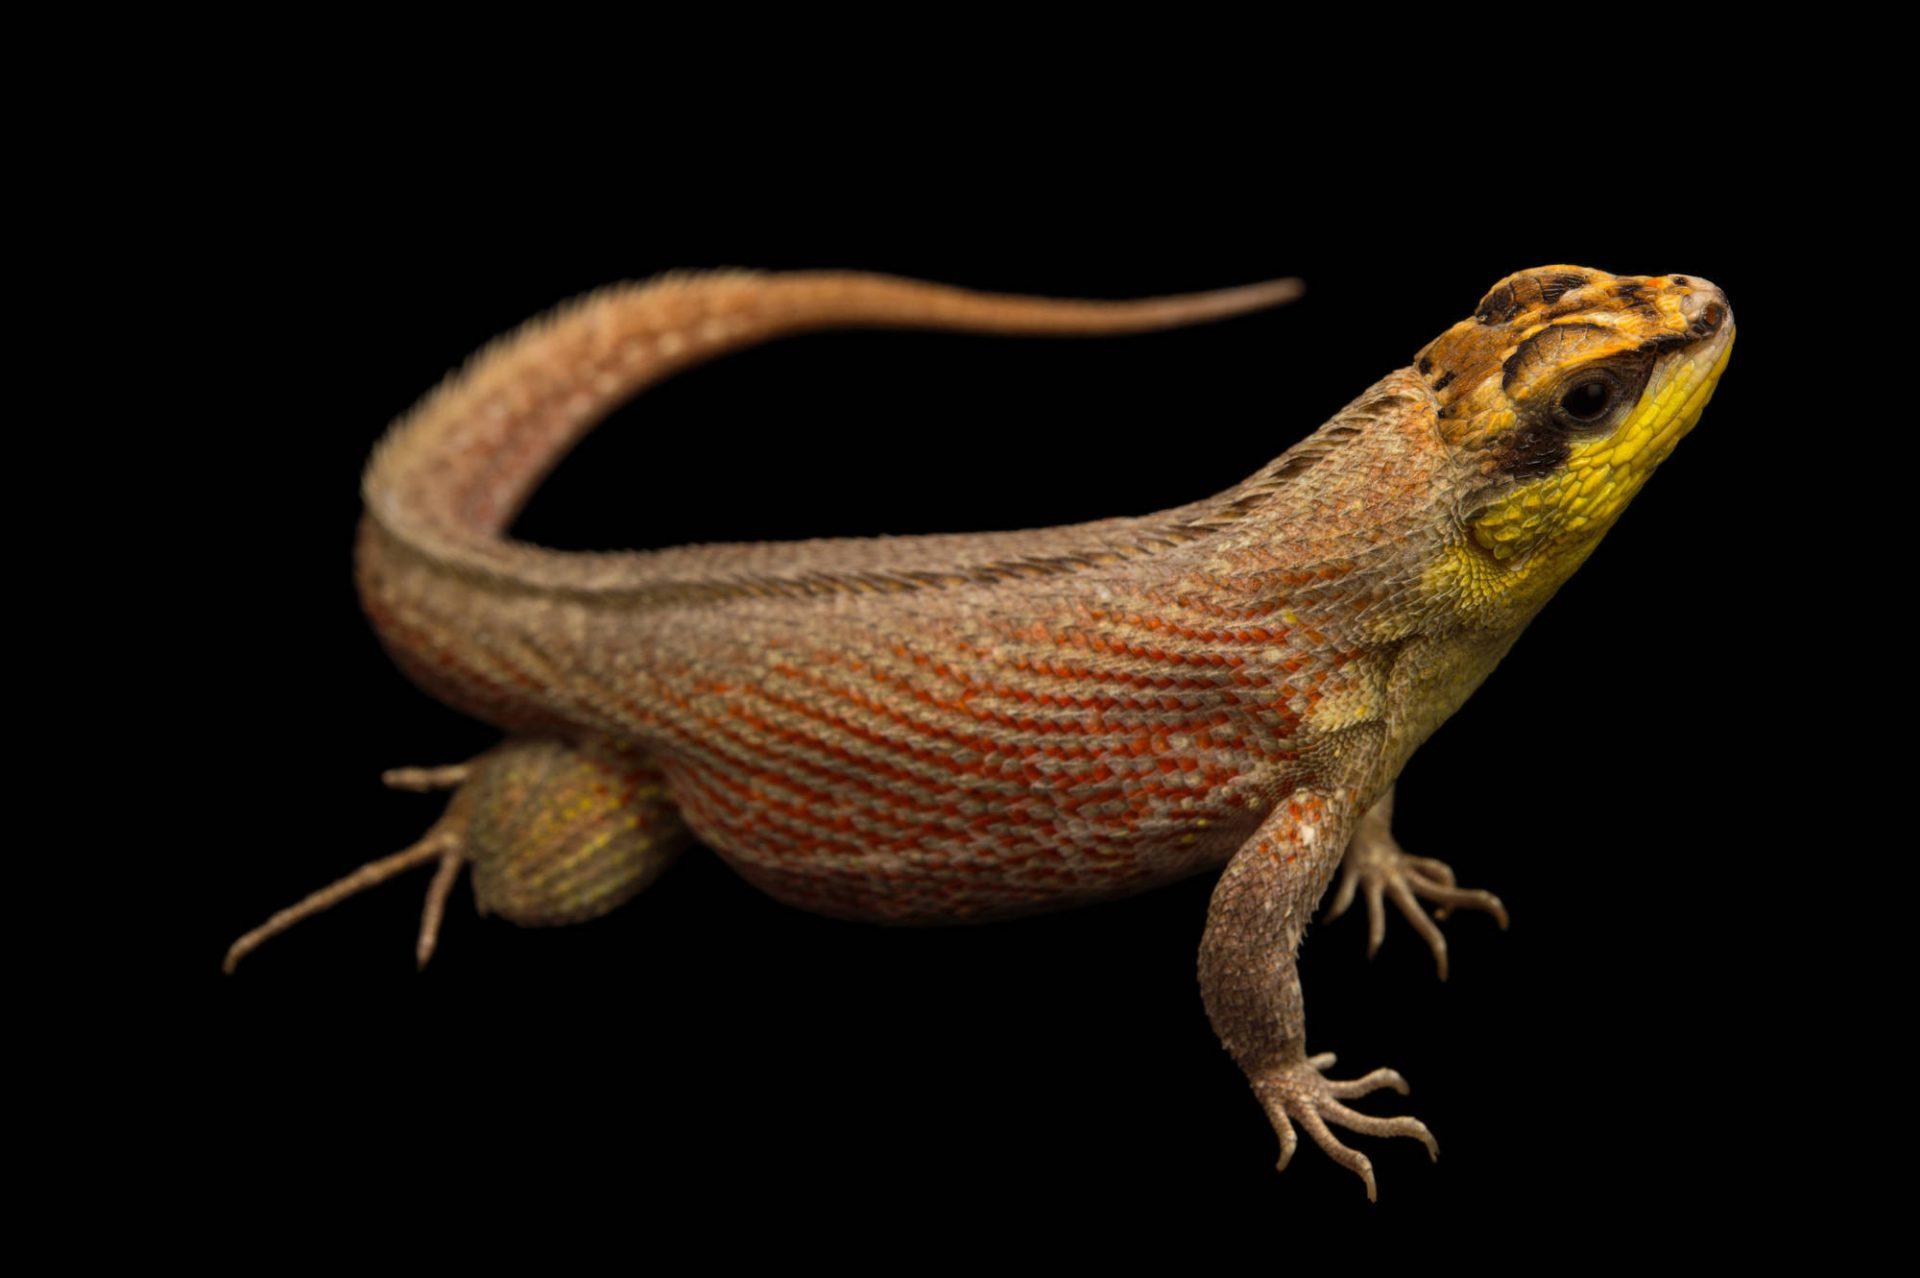 Picture of a Haitian curlytail lizard (Leiocephalus personatus mentalis) at the Parque Zoologico Nacional in Santo Domingo, Dominican Republic.